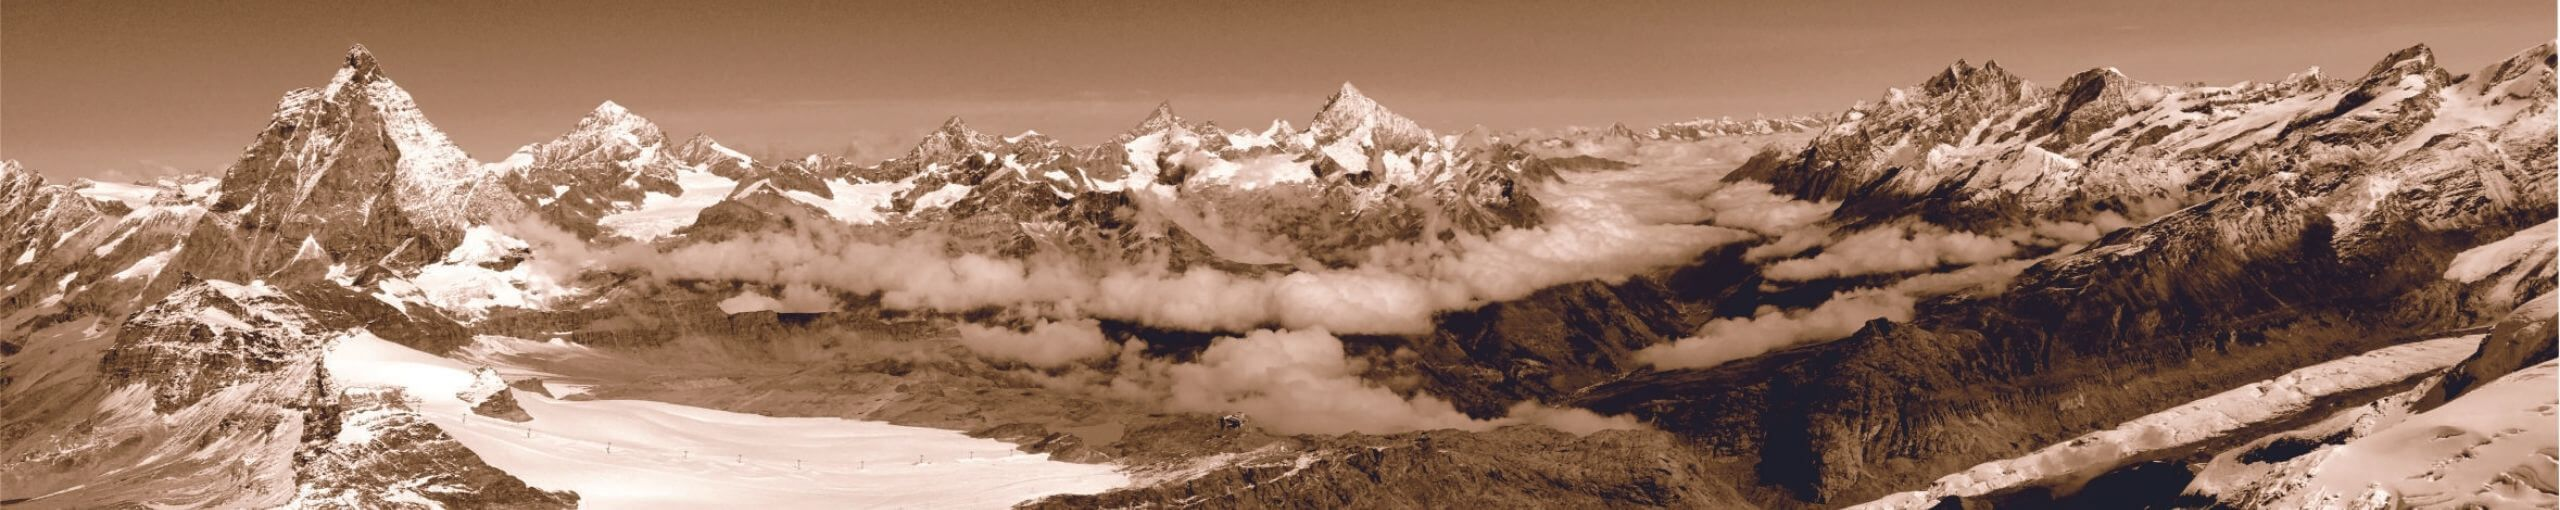 La Conquista del Cervino, Zermatt. Suiza.